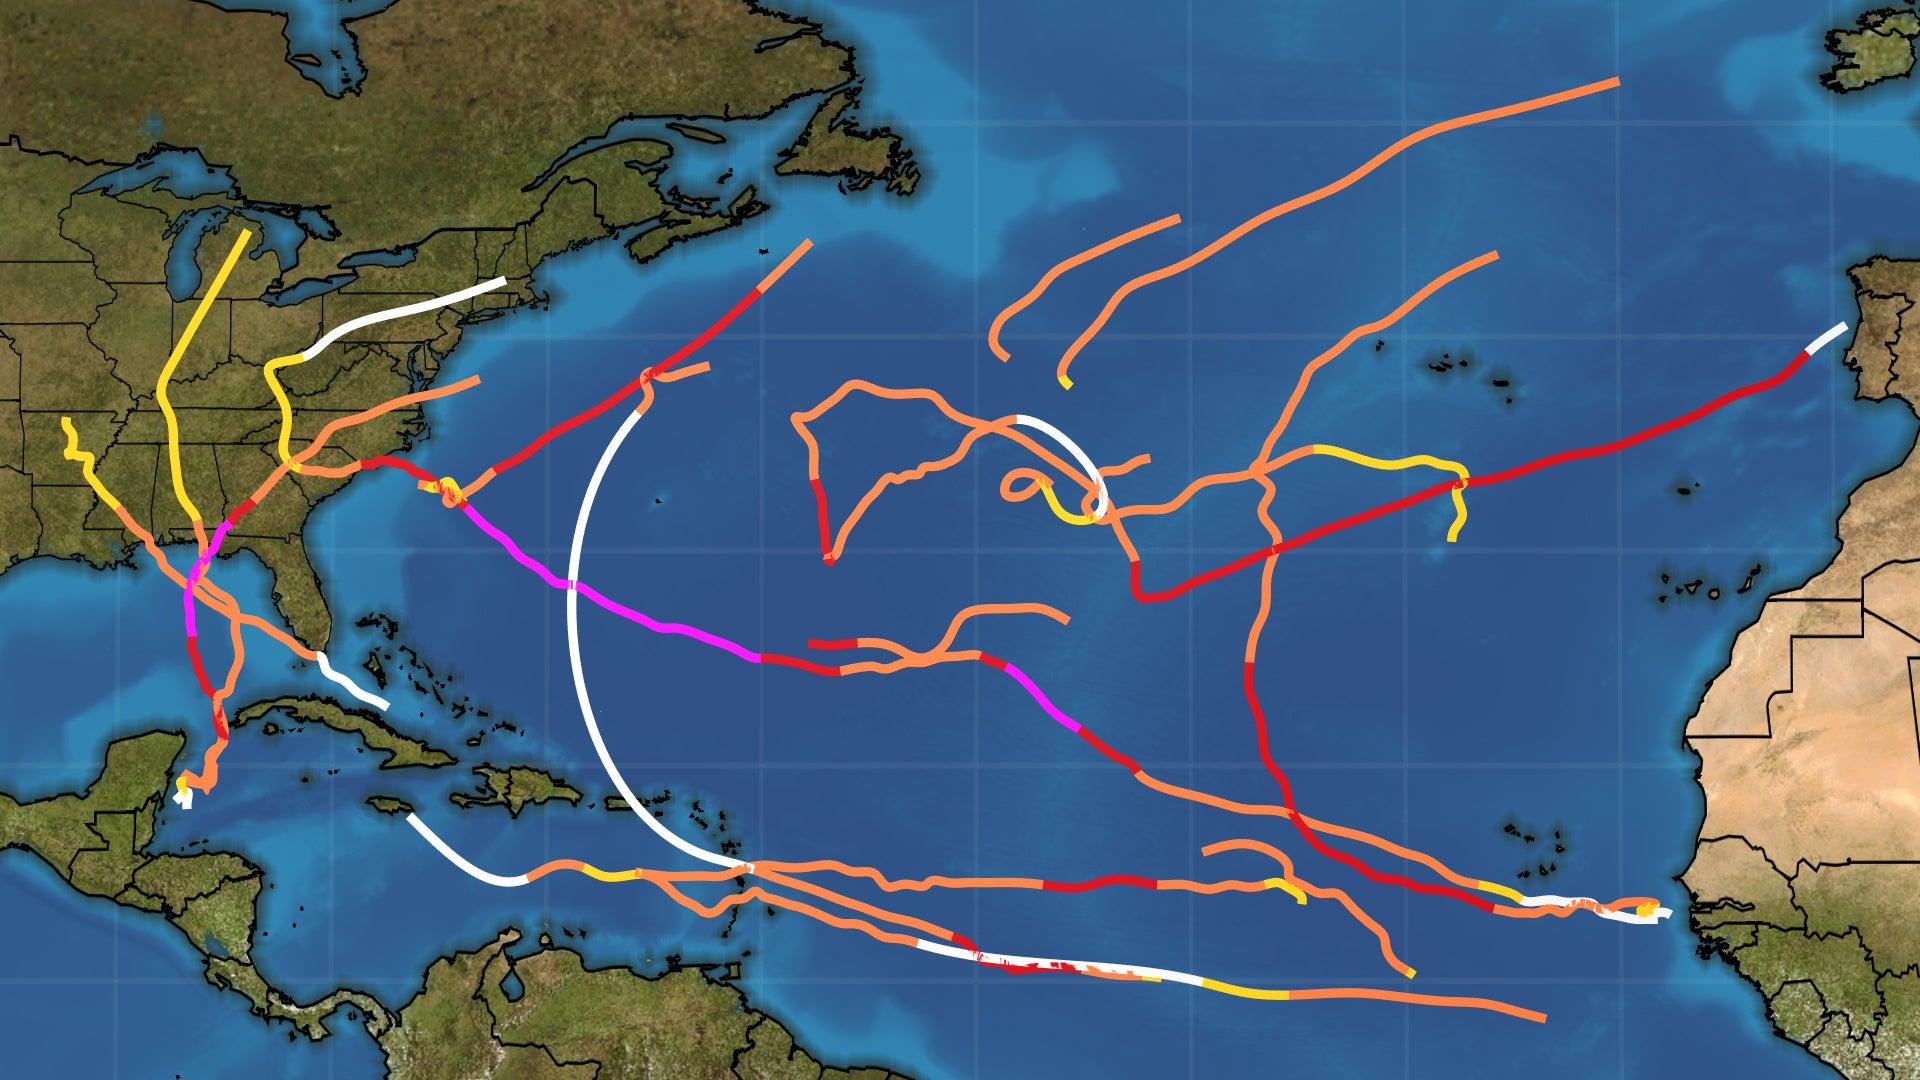 5 reasons the 2018 atlantic hurricane season has been